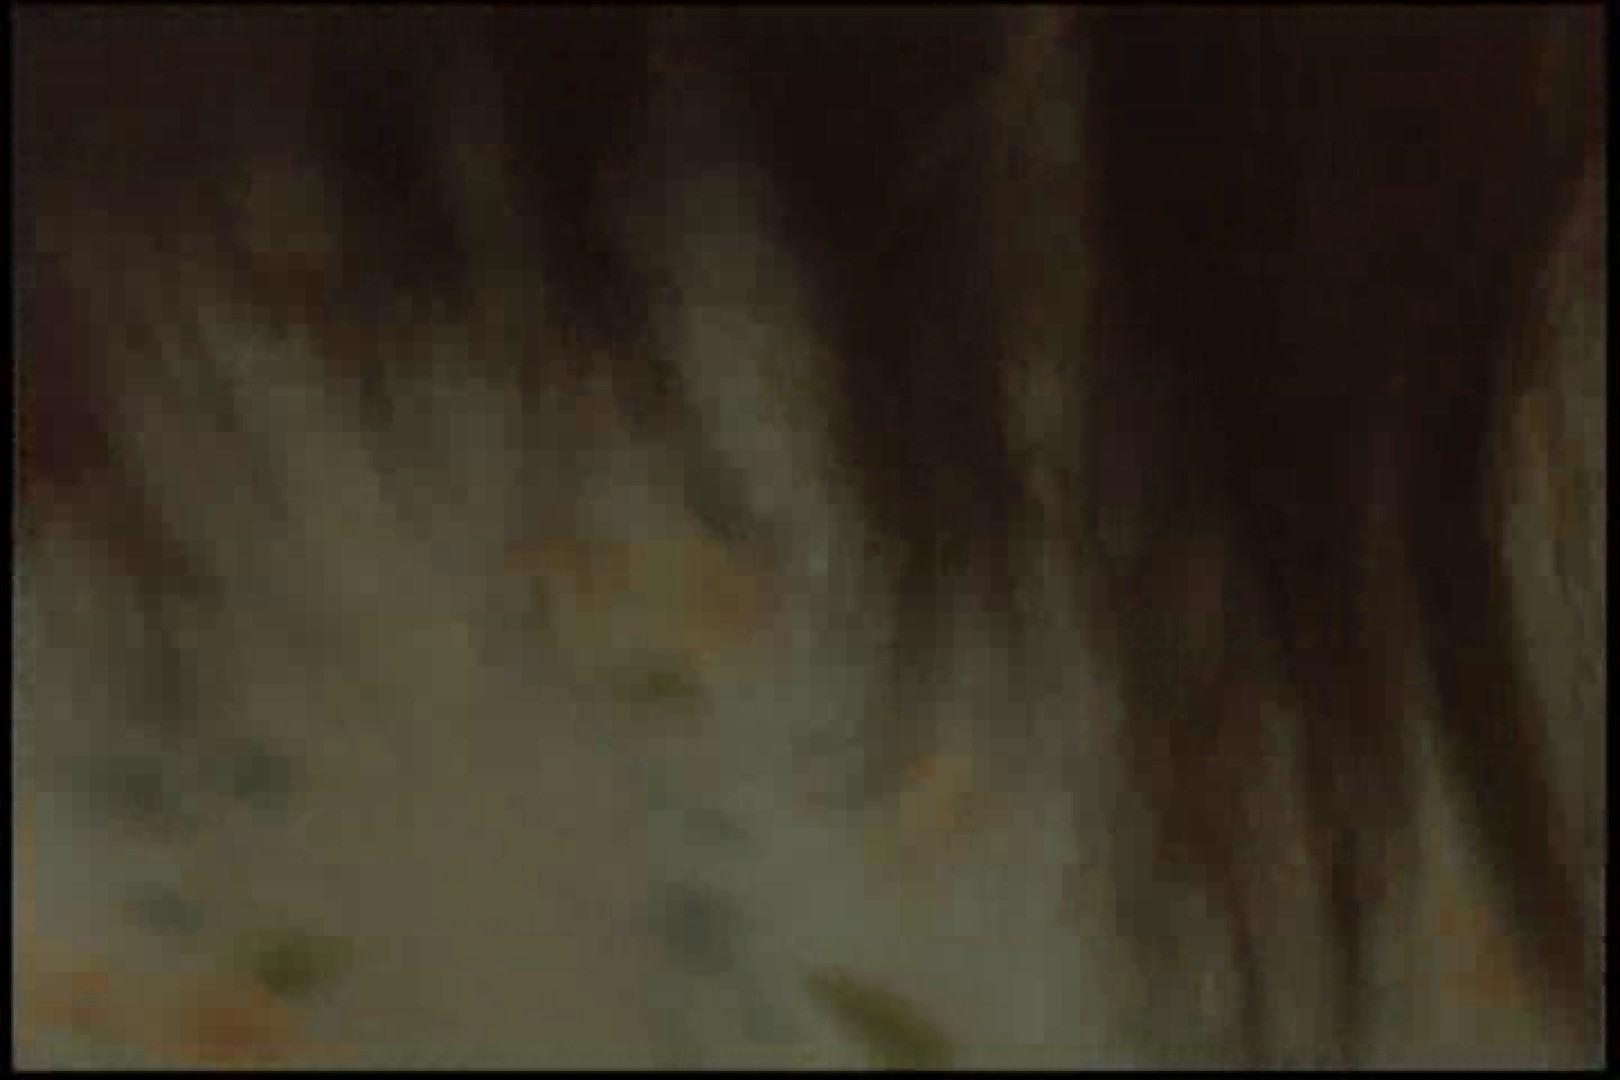 Hなフェロモン漂わせまくりな美人妻 佐々木薫子 喘ぎ エロ無料画像 67連発 24